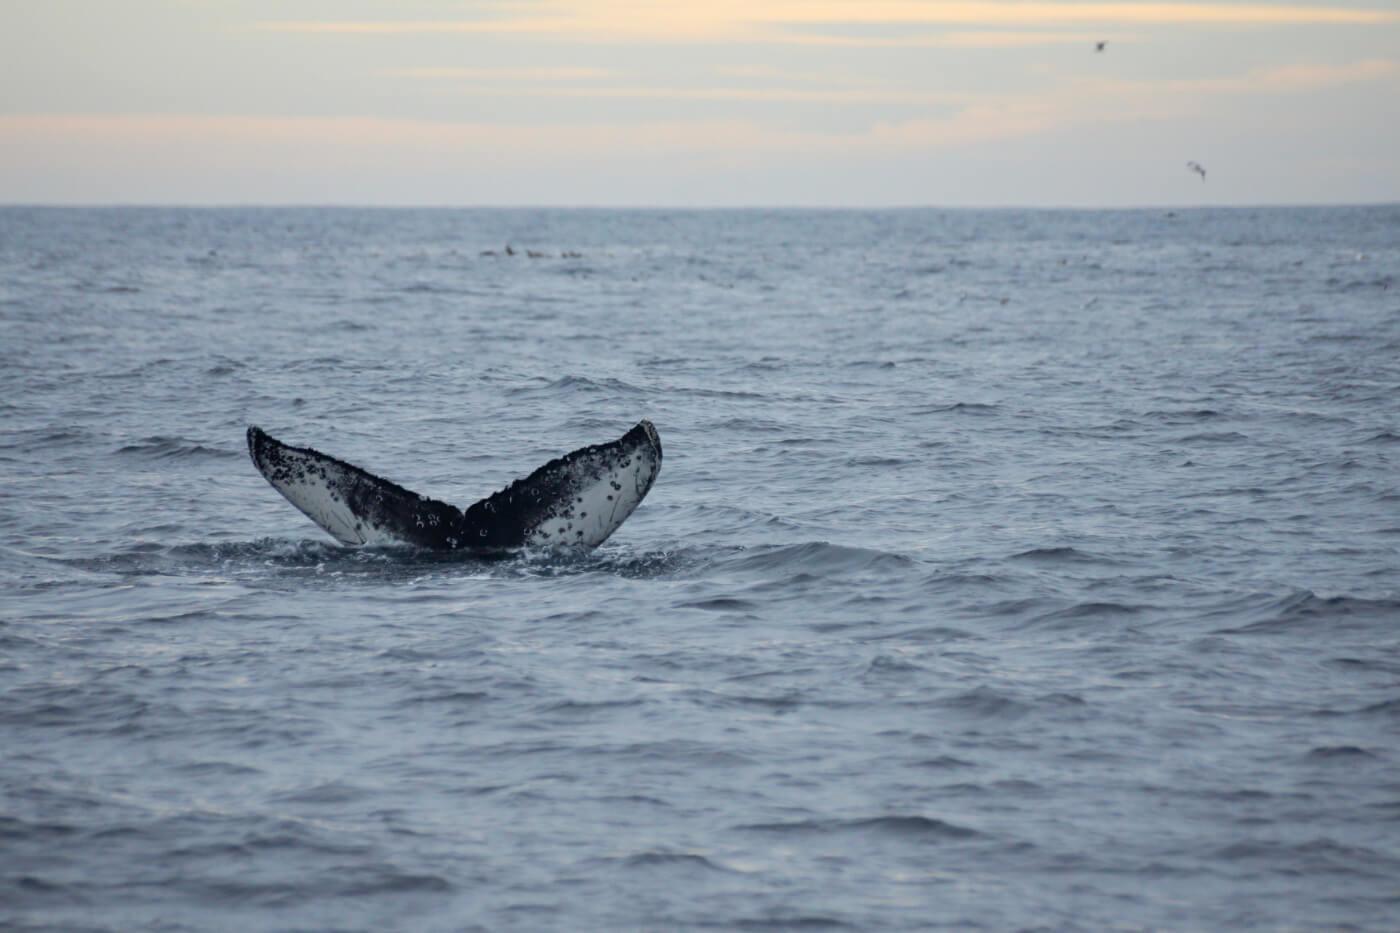 Southbound gray whale flukes 9 miles offshore. © Chris Biertuempfel